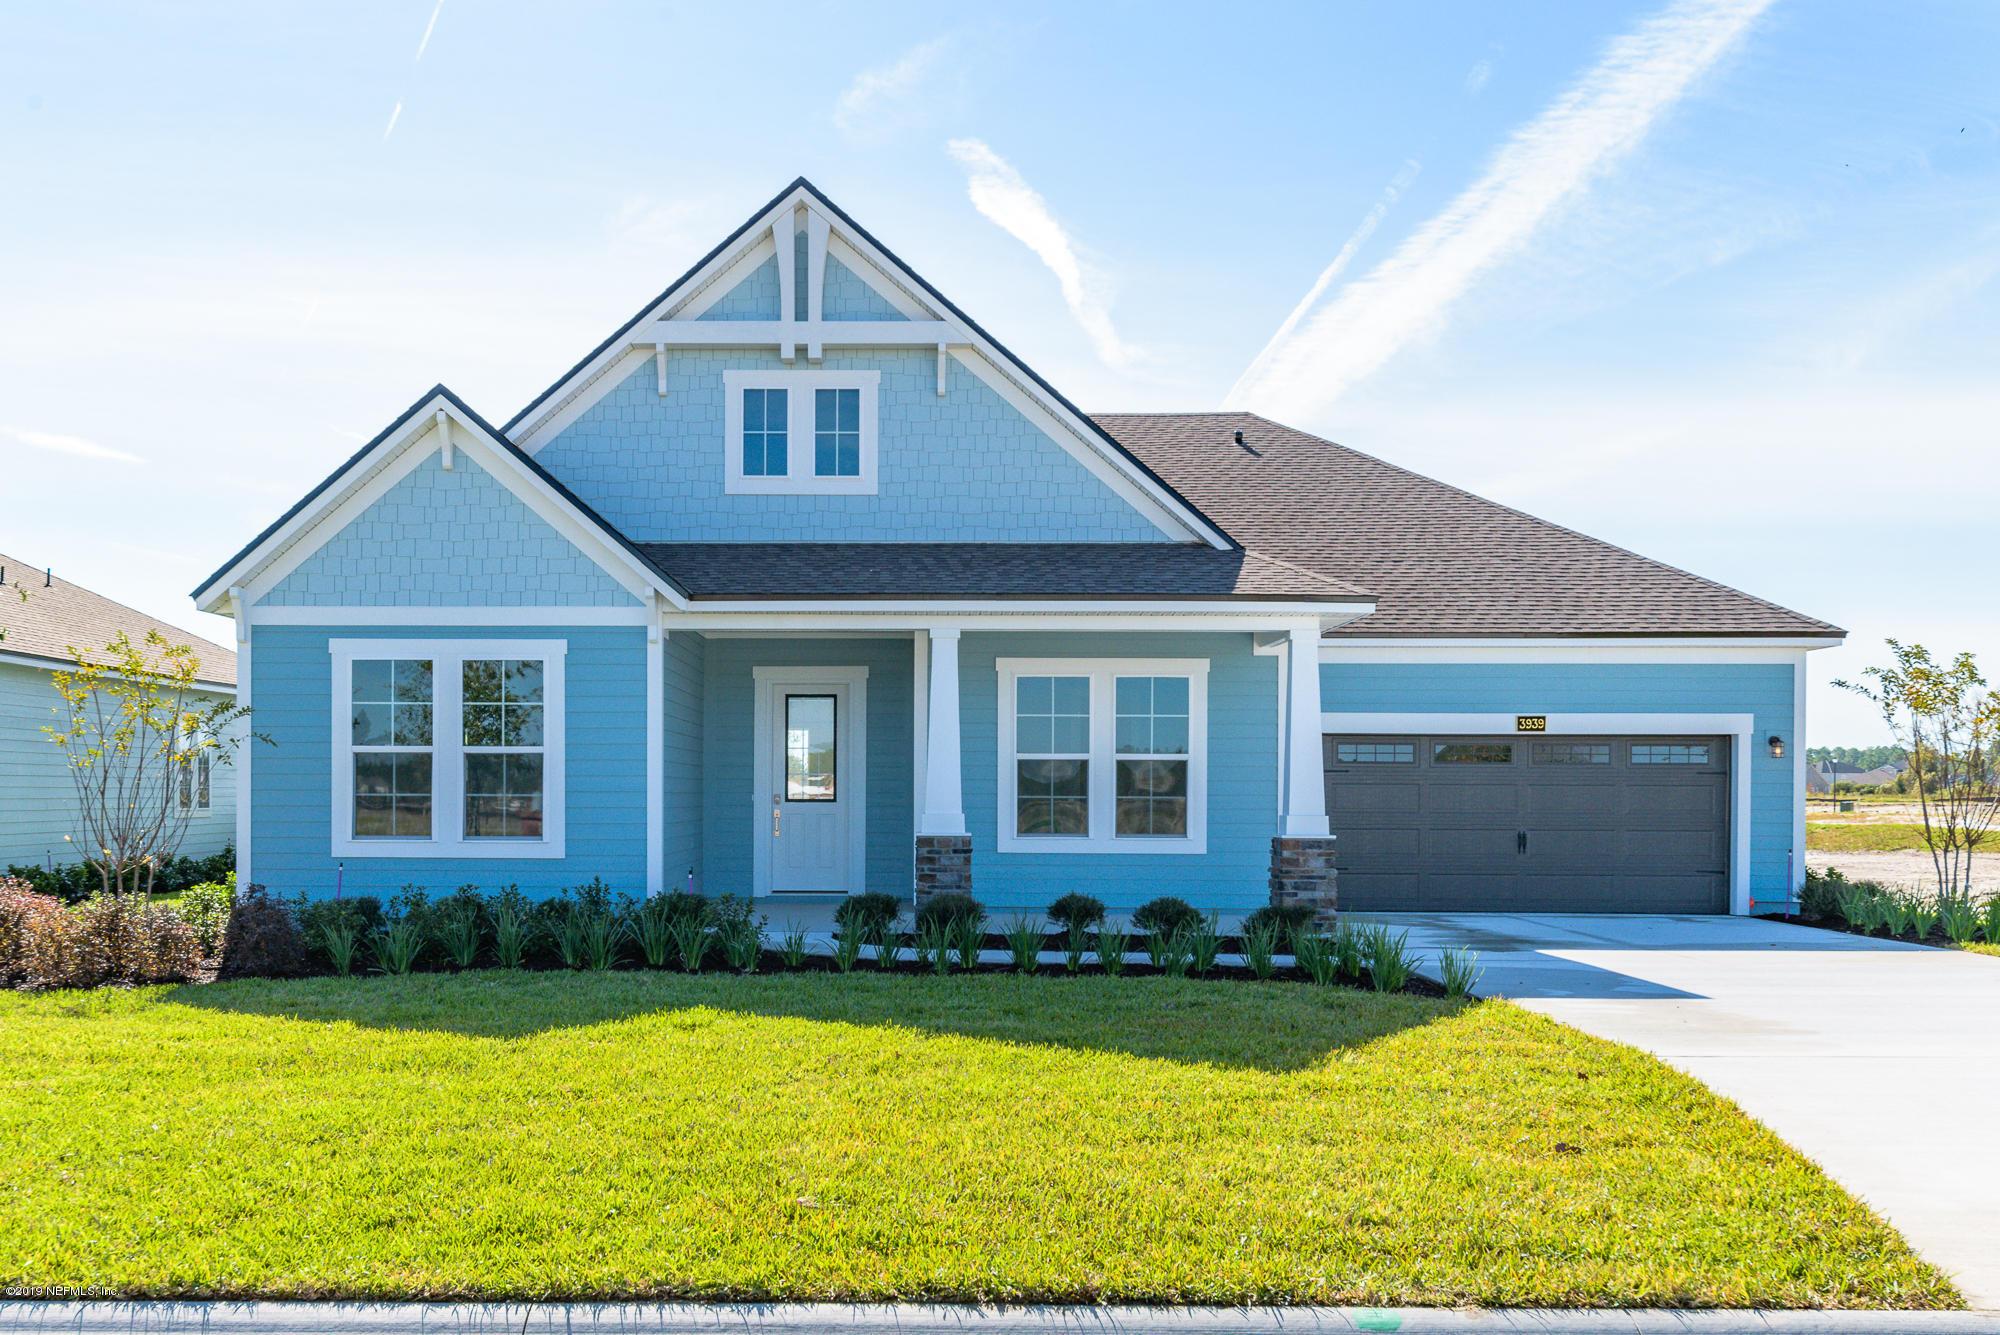 3939 SPYGLASS HILL, ORANGE PARK, FLORIDA 32065, 3 Bedrooms Bedrooms, ,3 BathroomsBathrooms,Residential - single family,For sale,SPYGLASS HILL,1007279